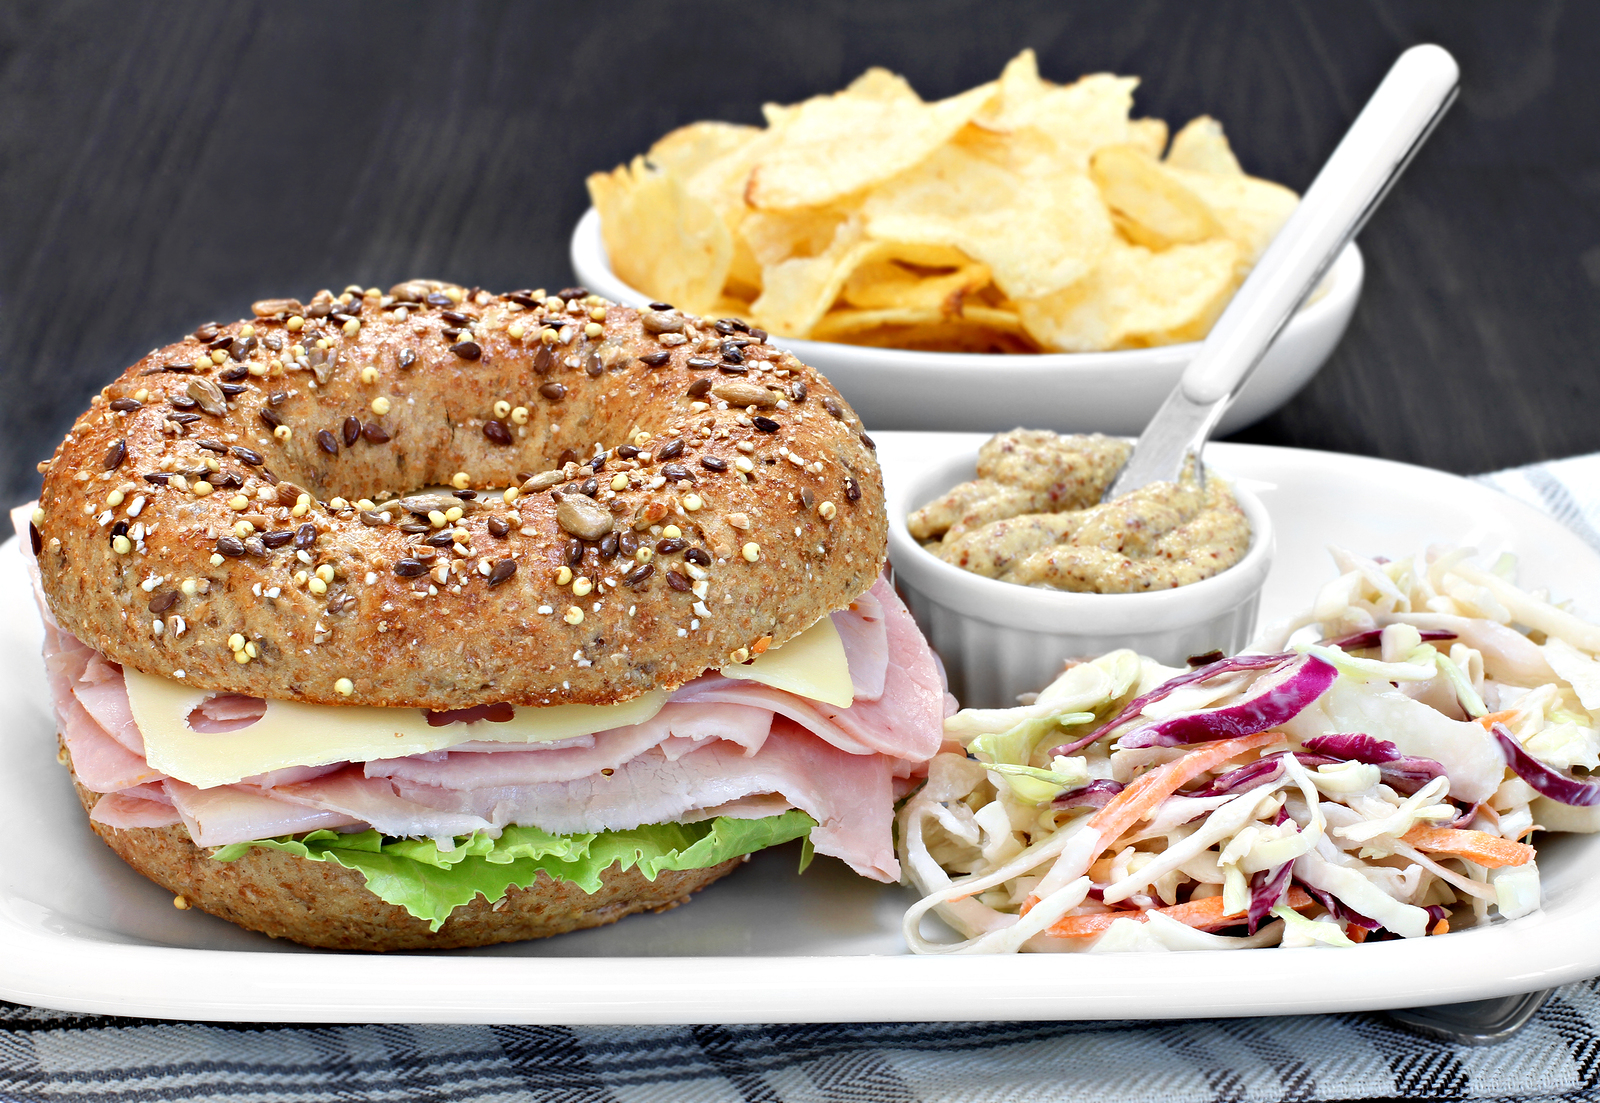 bigstock-Bagel-Ham-Cheese-And-Lettuce--107410874.jpg